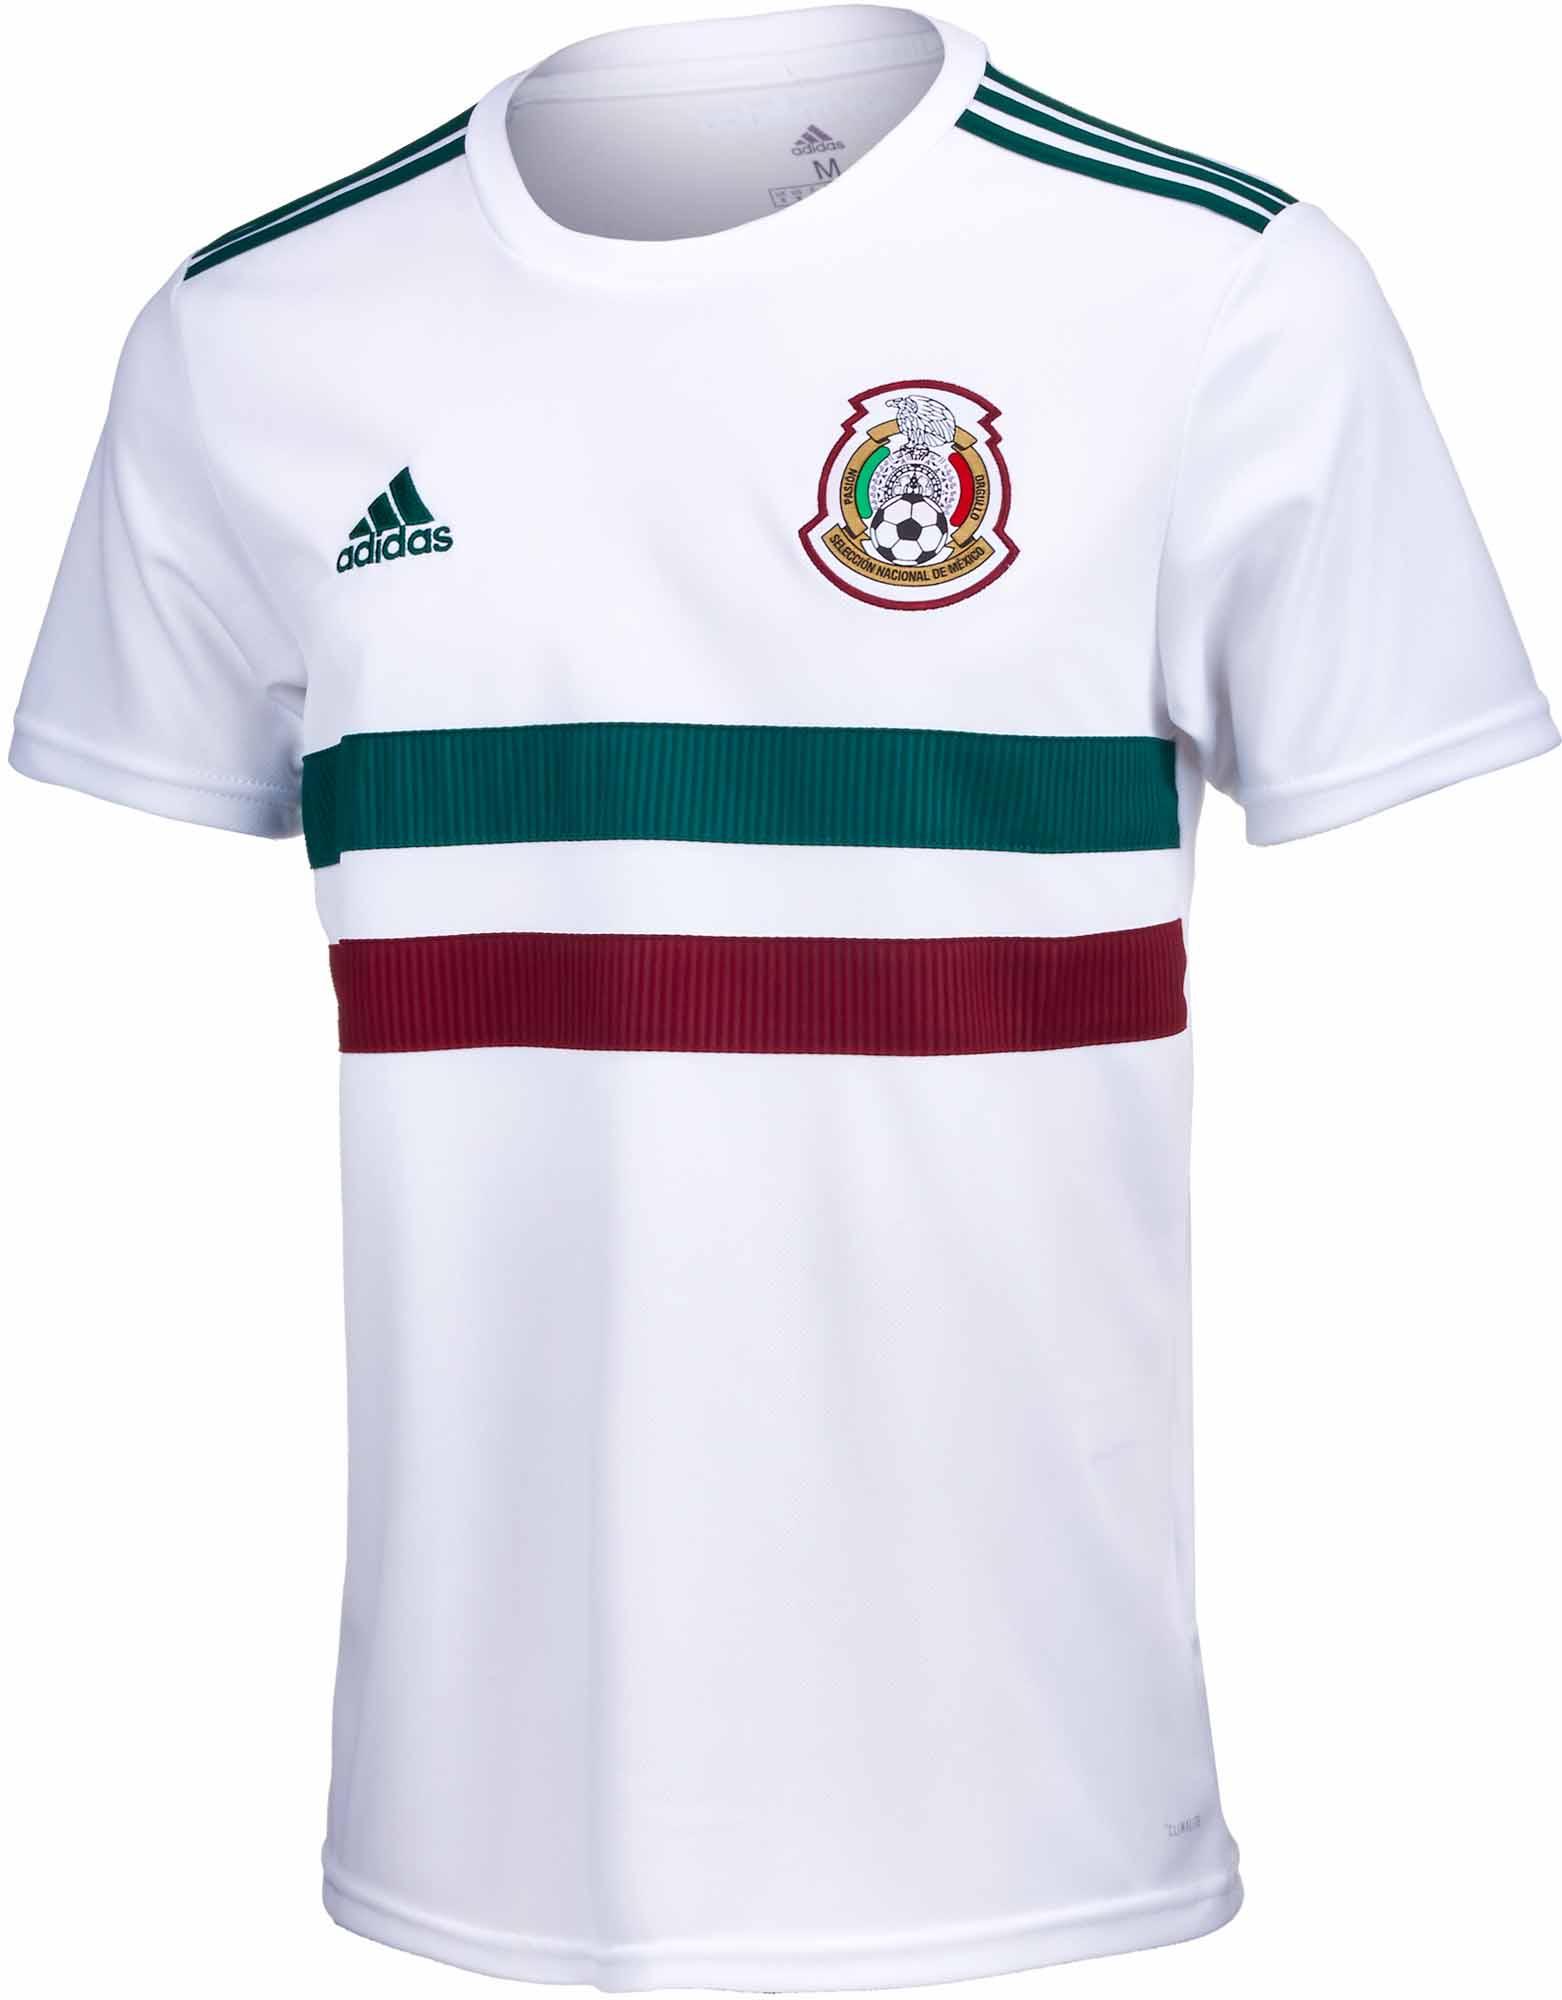 548ca437b54df adidas Mexico Away Jersey 2018-19 - SoccerPro.com